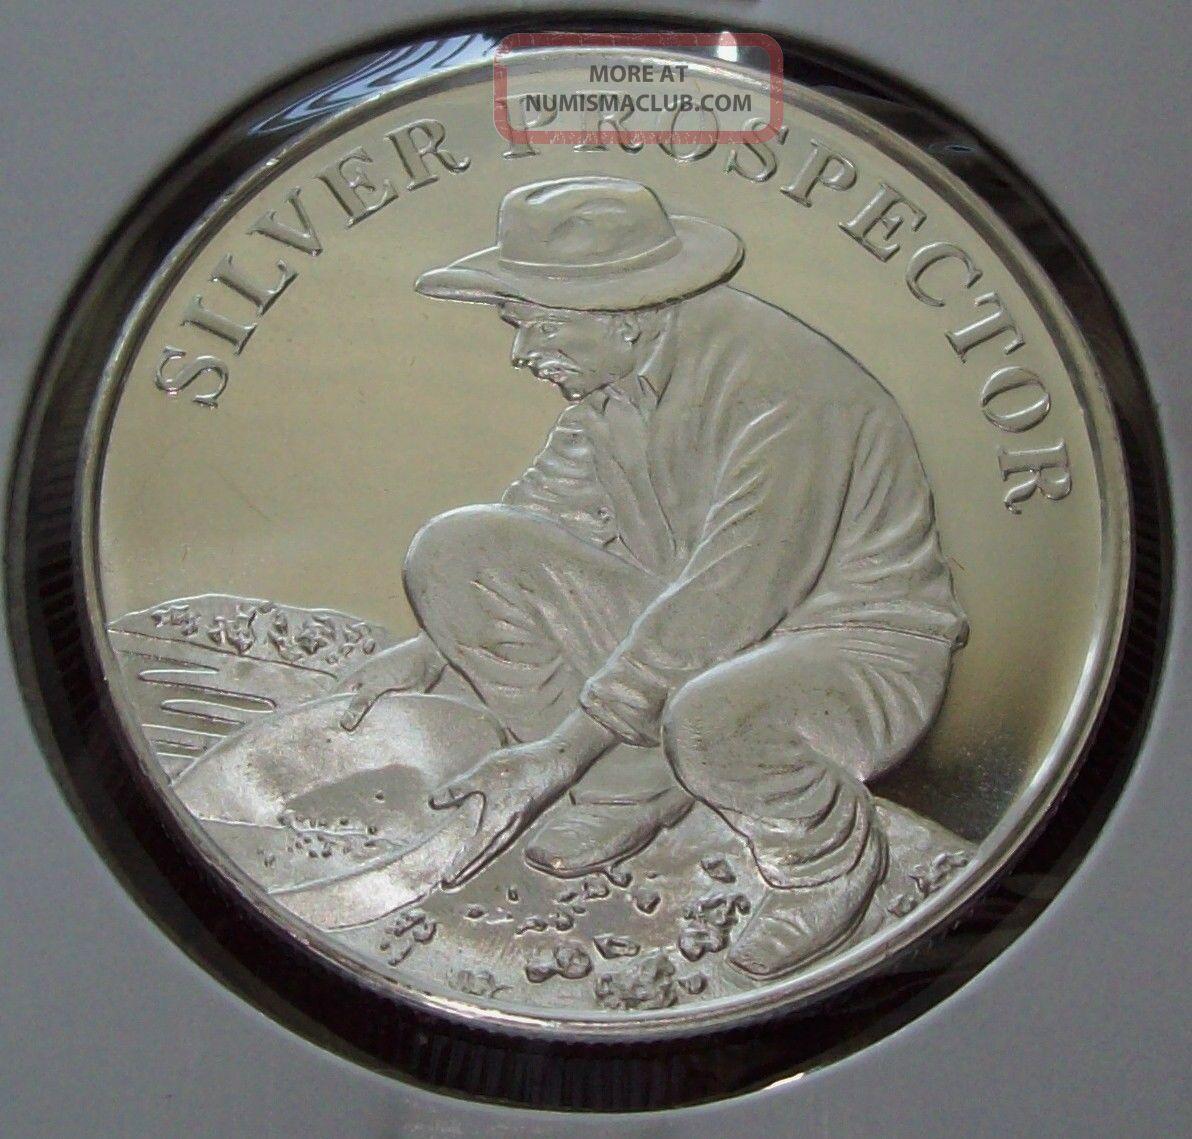 Silver Prospector 1 Troy Oz 999 Fine Silver Round One Ounce Bullion